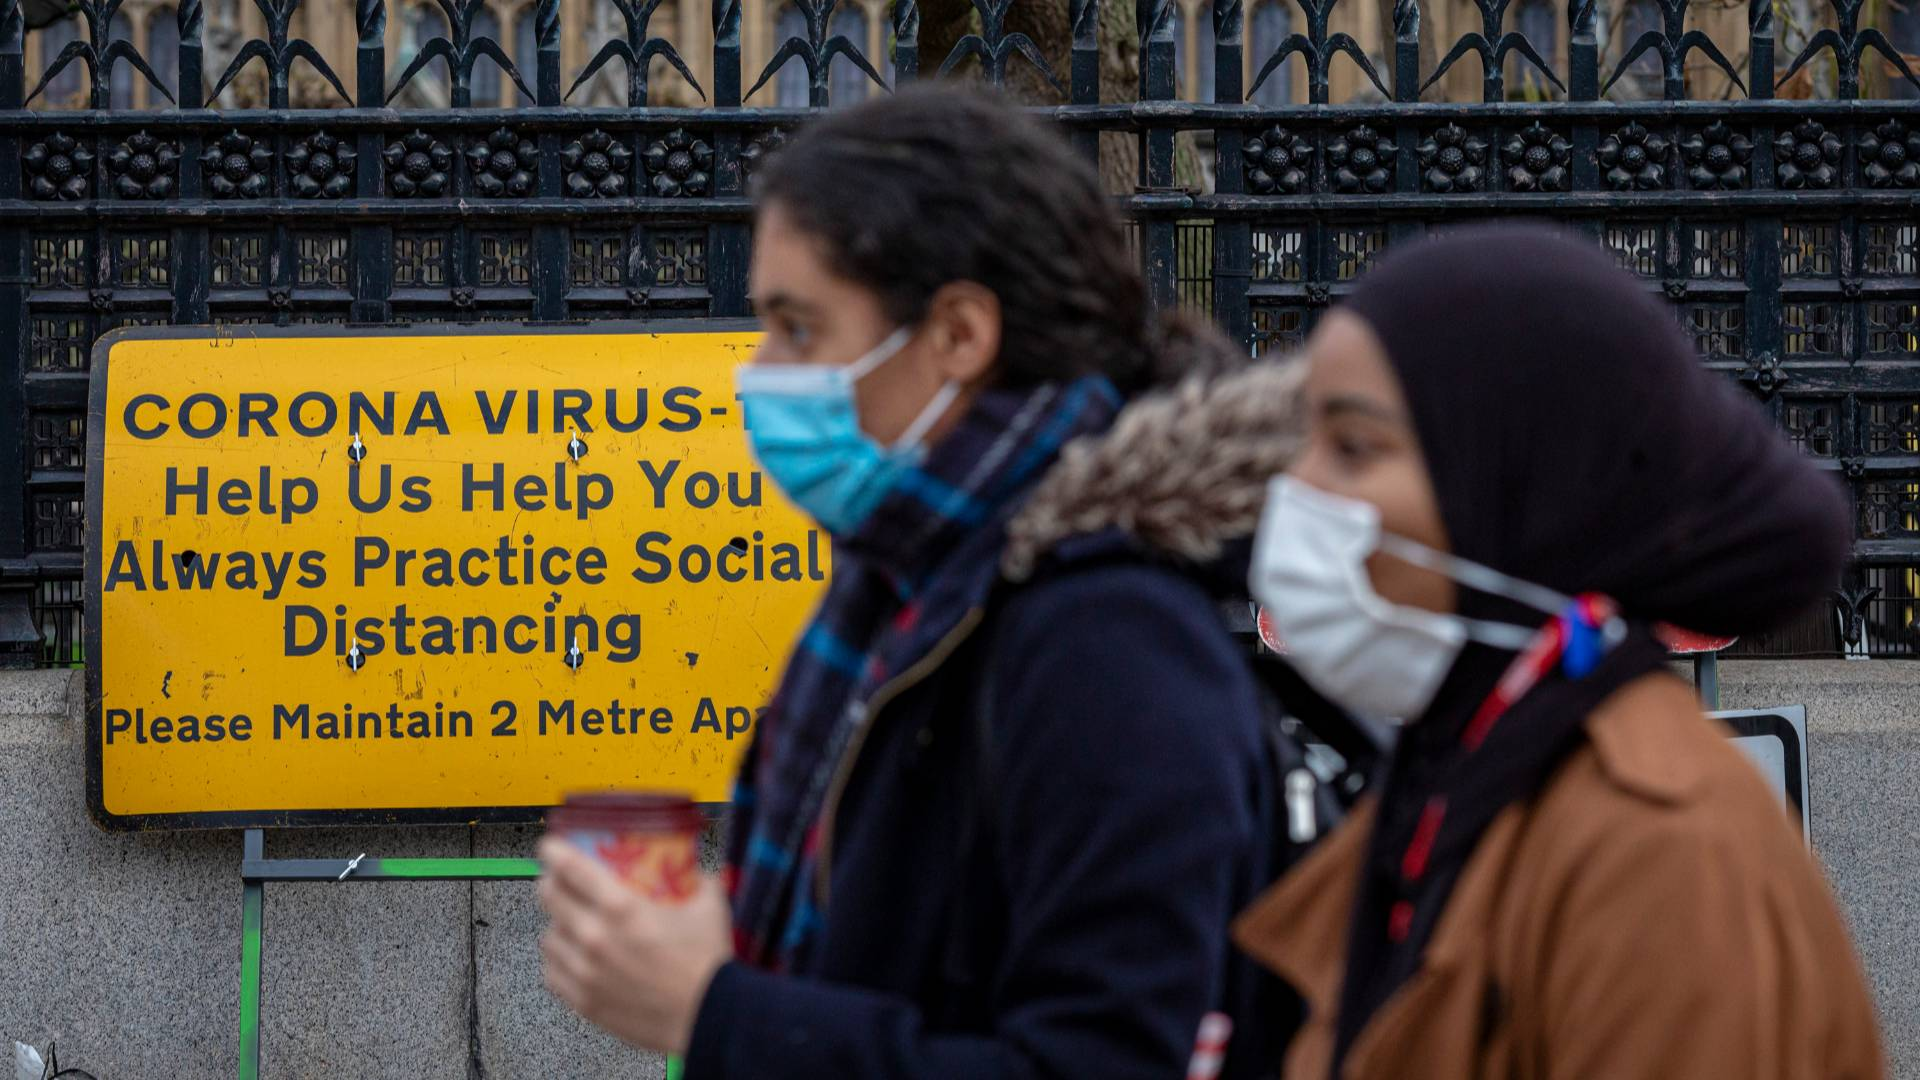 <p>Фото © ТАСС / Rob Pinney / London News Pictures via ZUMA Wire</p>